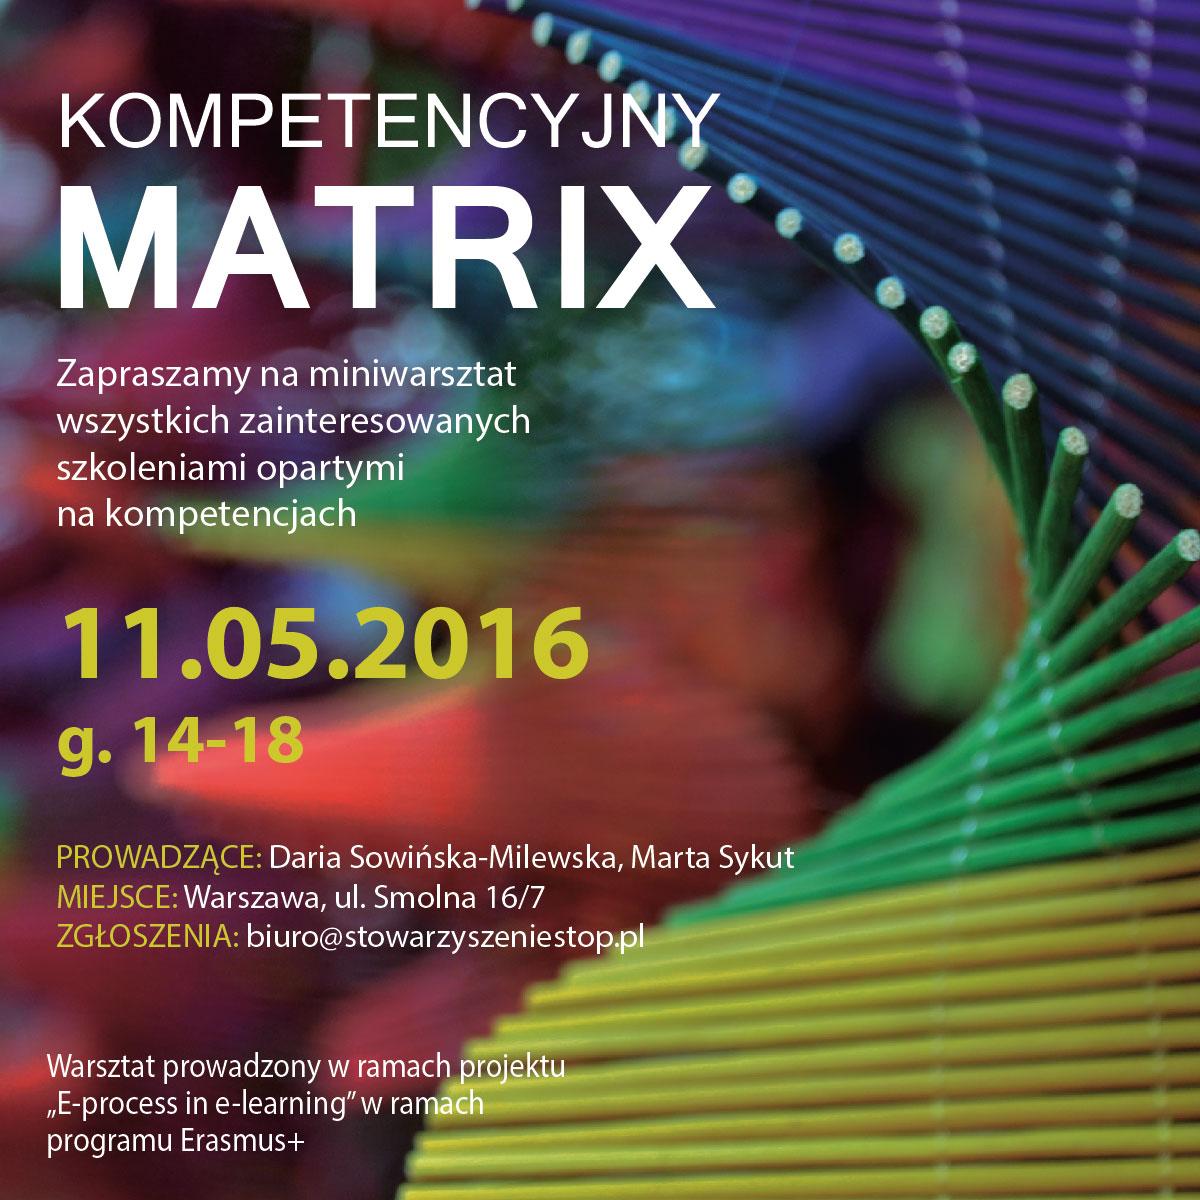 Kompetencyjny Matrix - warsztat 11 maja 2016